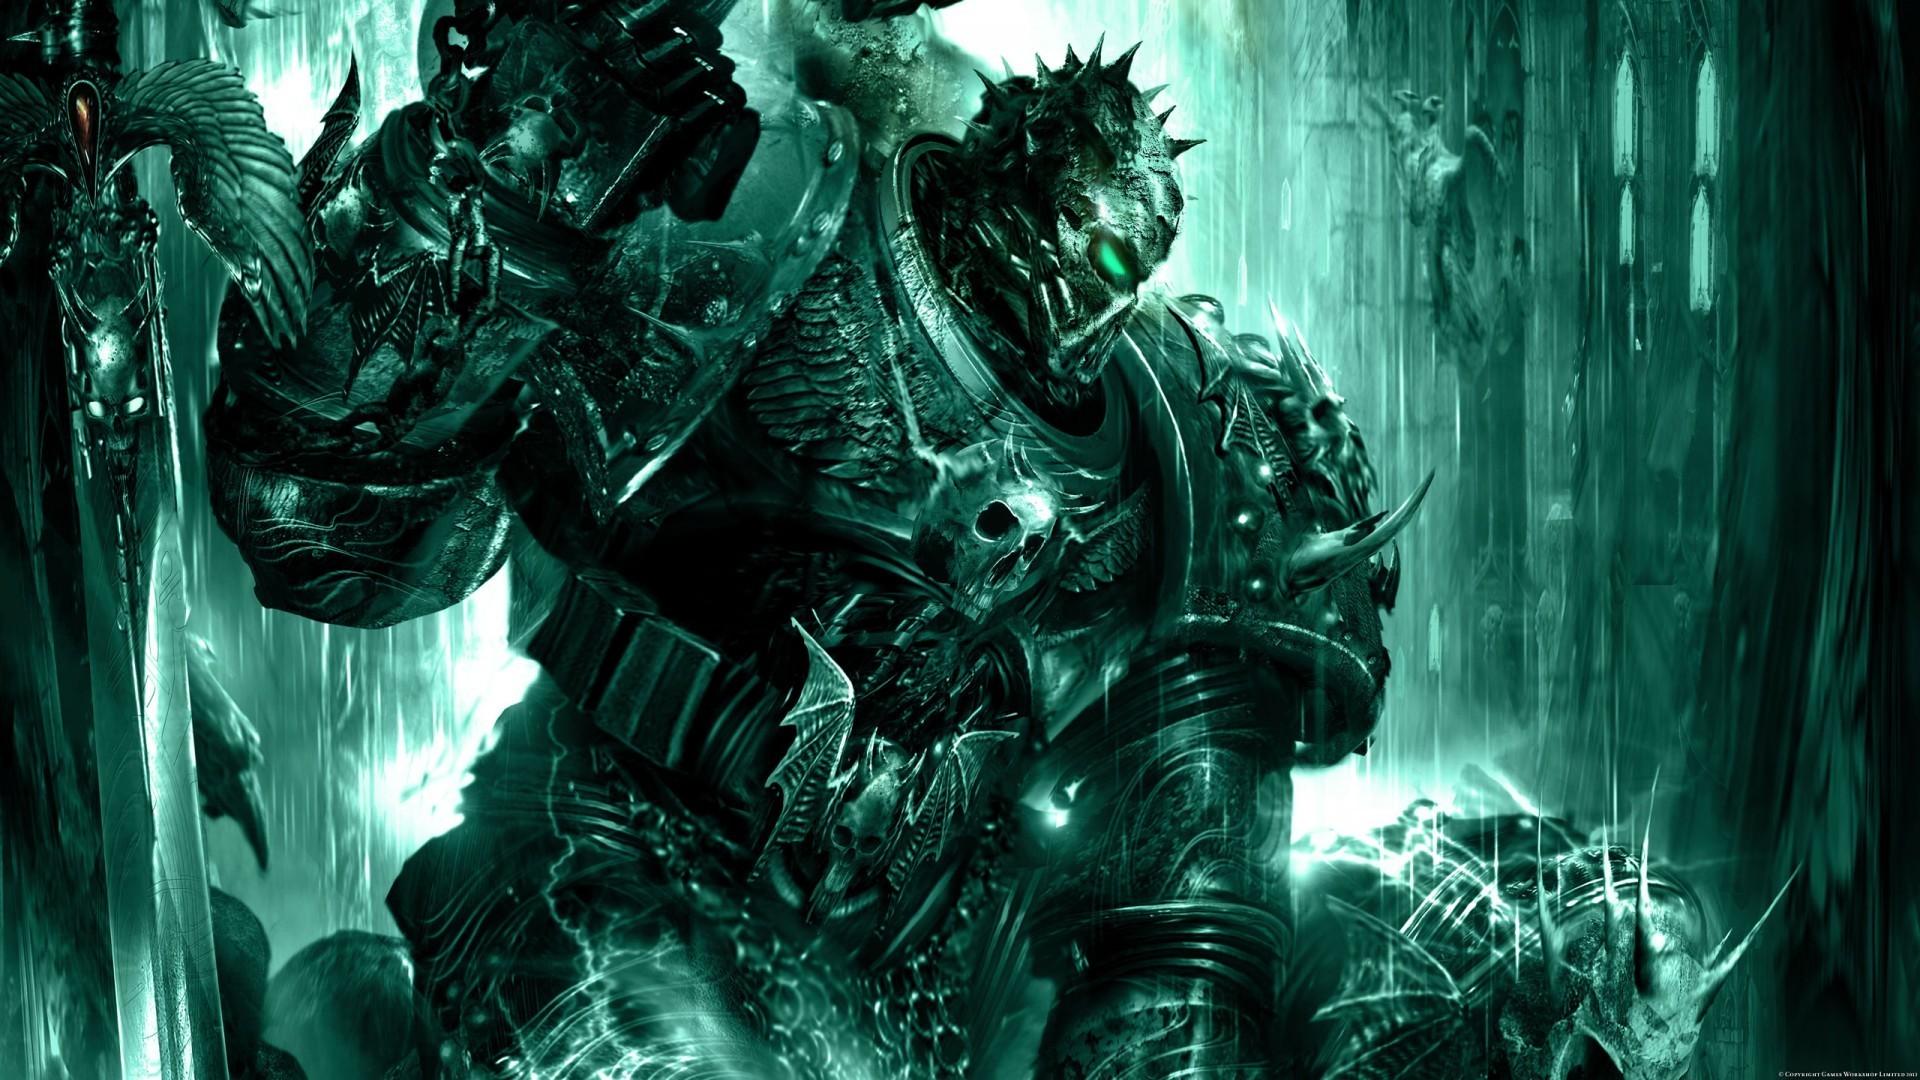 HD-wallpaper-Otife-Warhammer-40k-Fantasy-Art-Artwork-Chaos -Space-Marine-Soul-Hunter-Talos-Hd-Wallpaper-.jpg